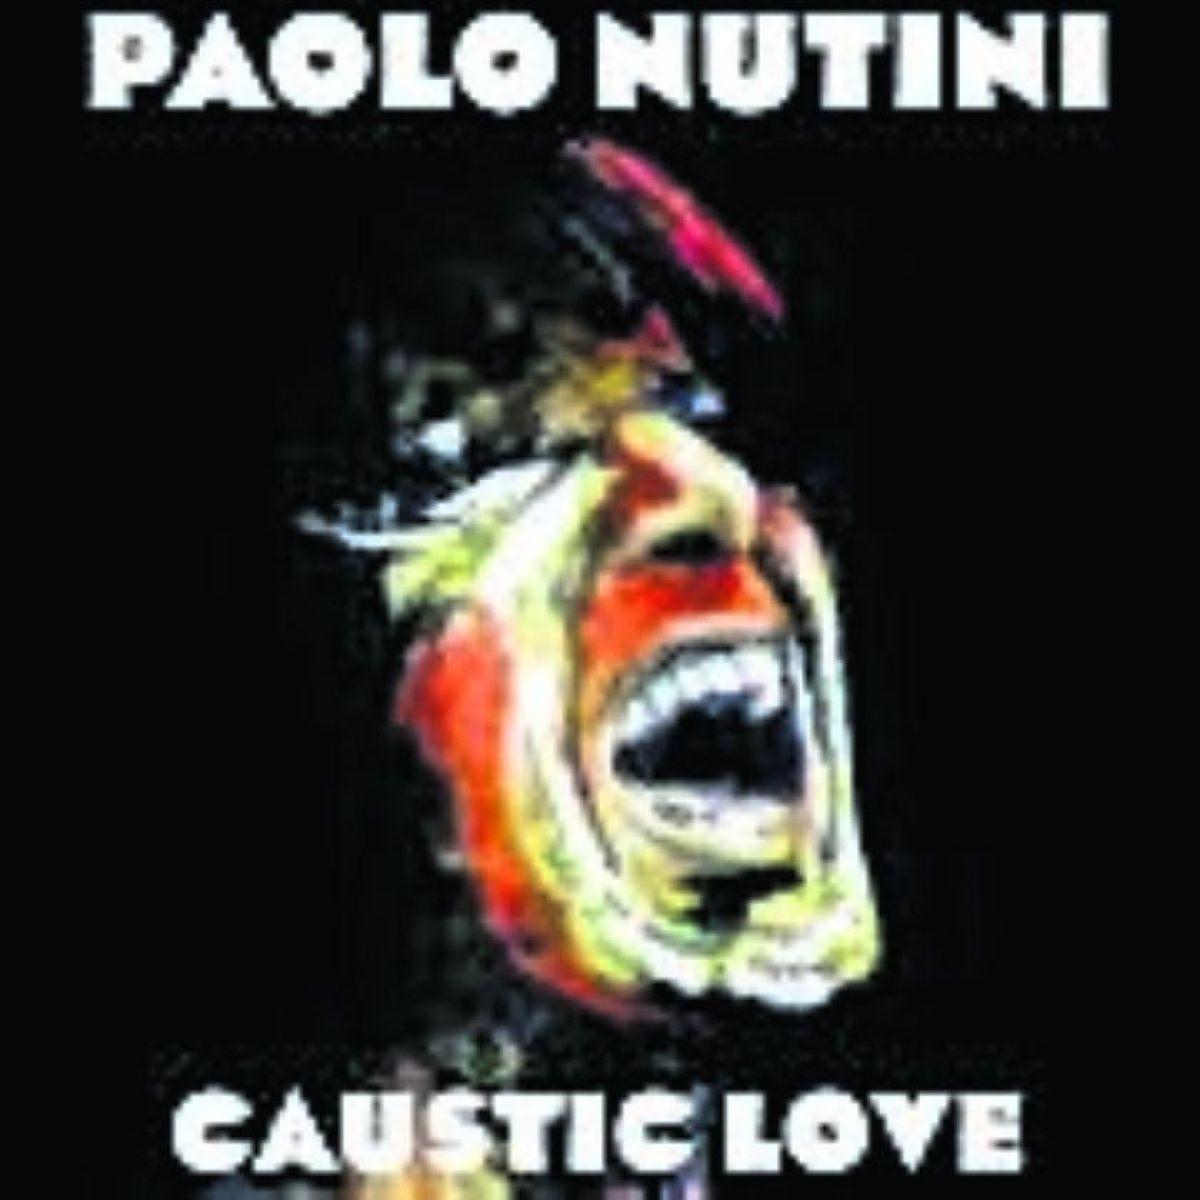 Paolo Nutini Caustic Love